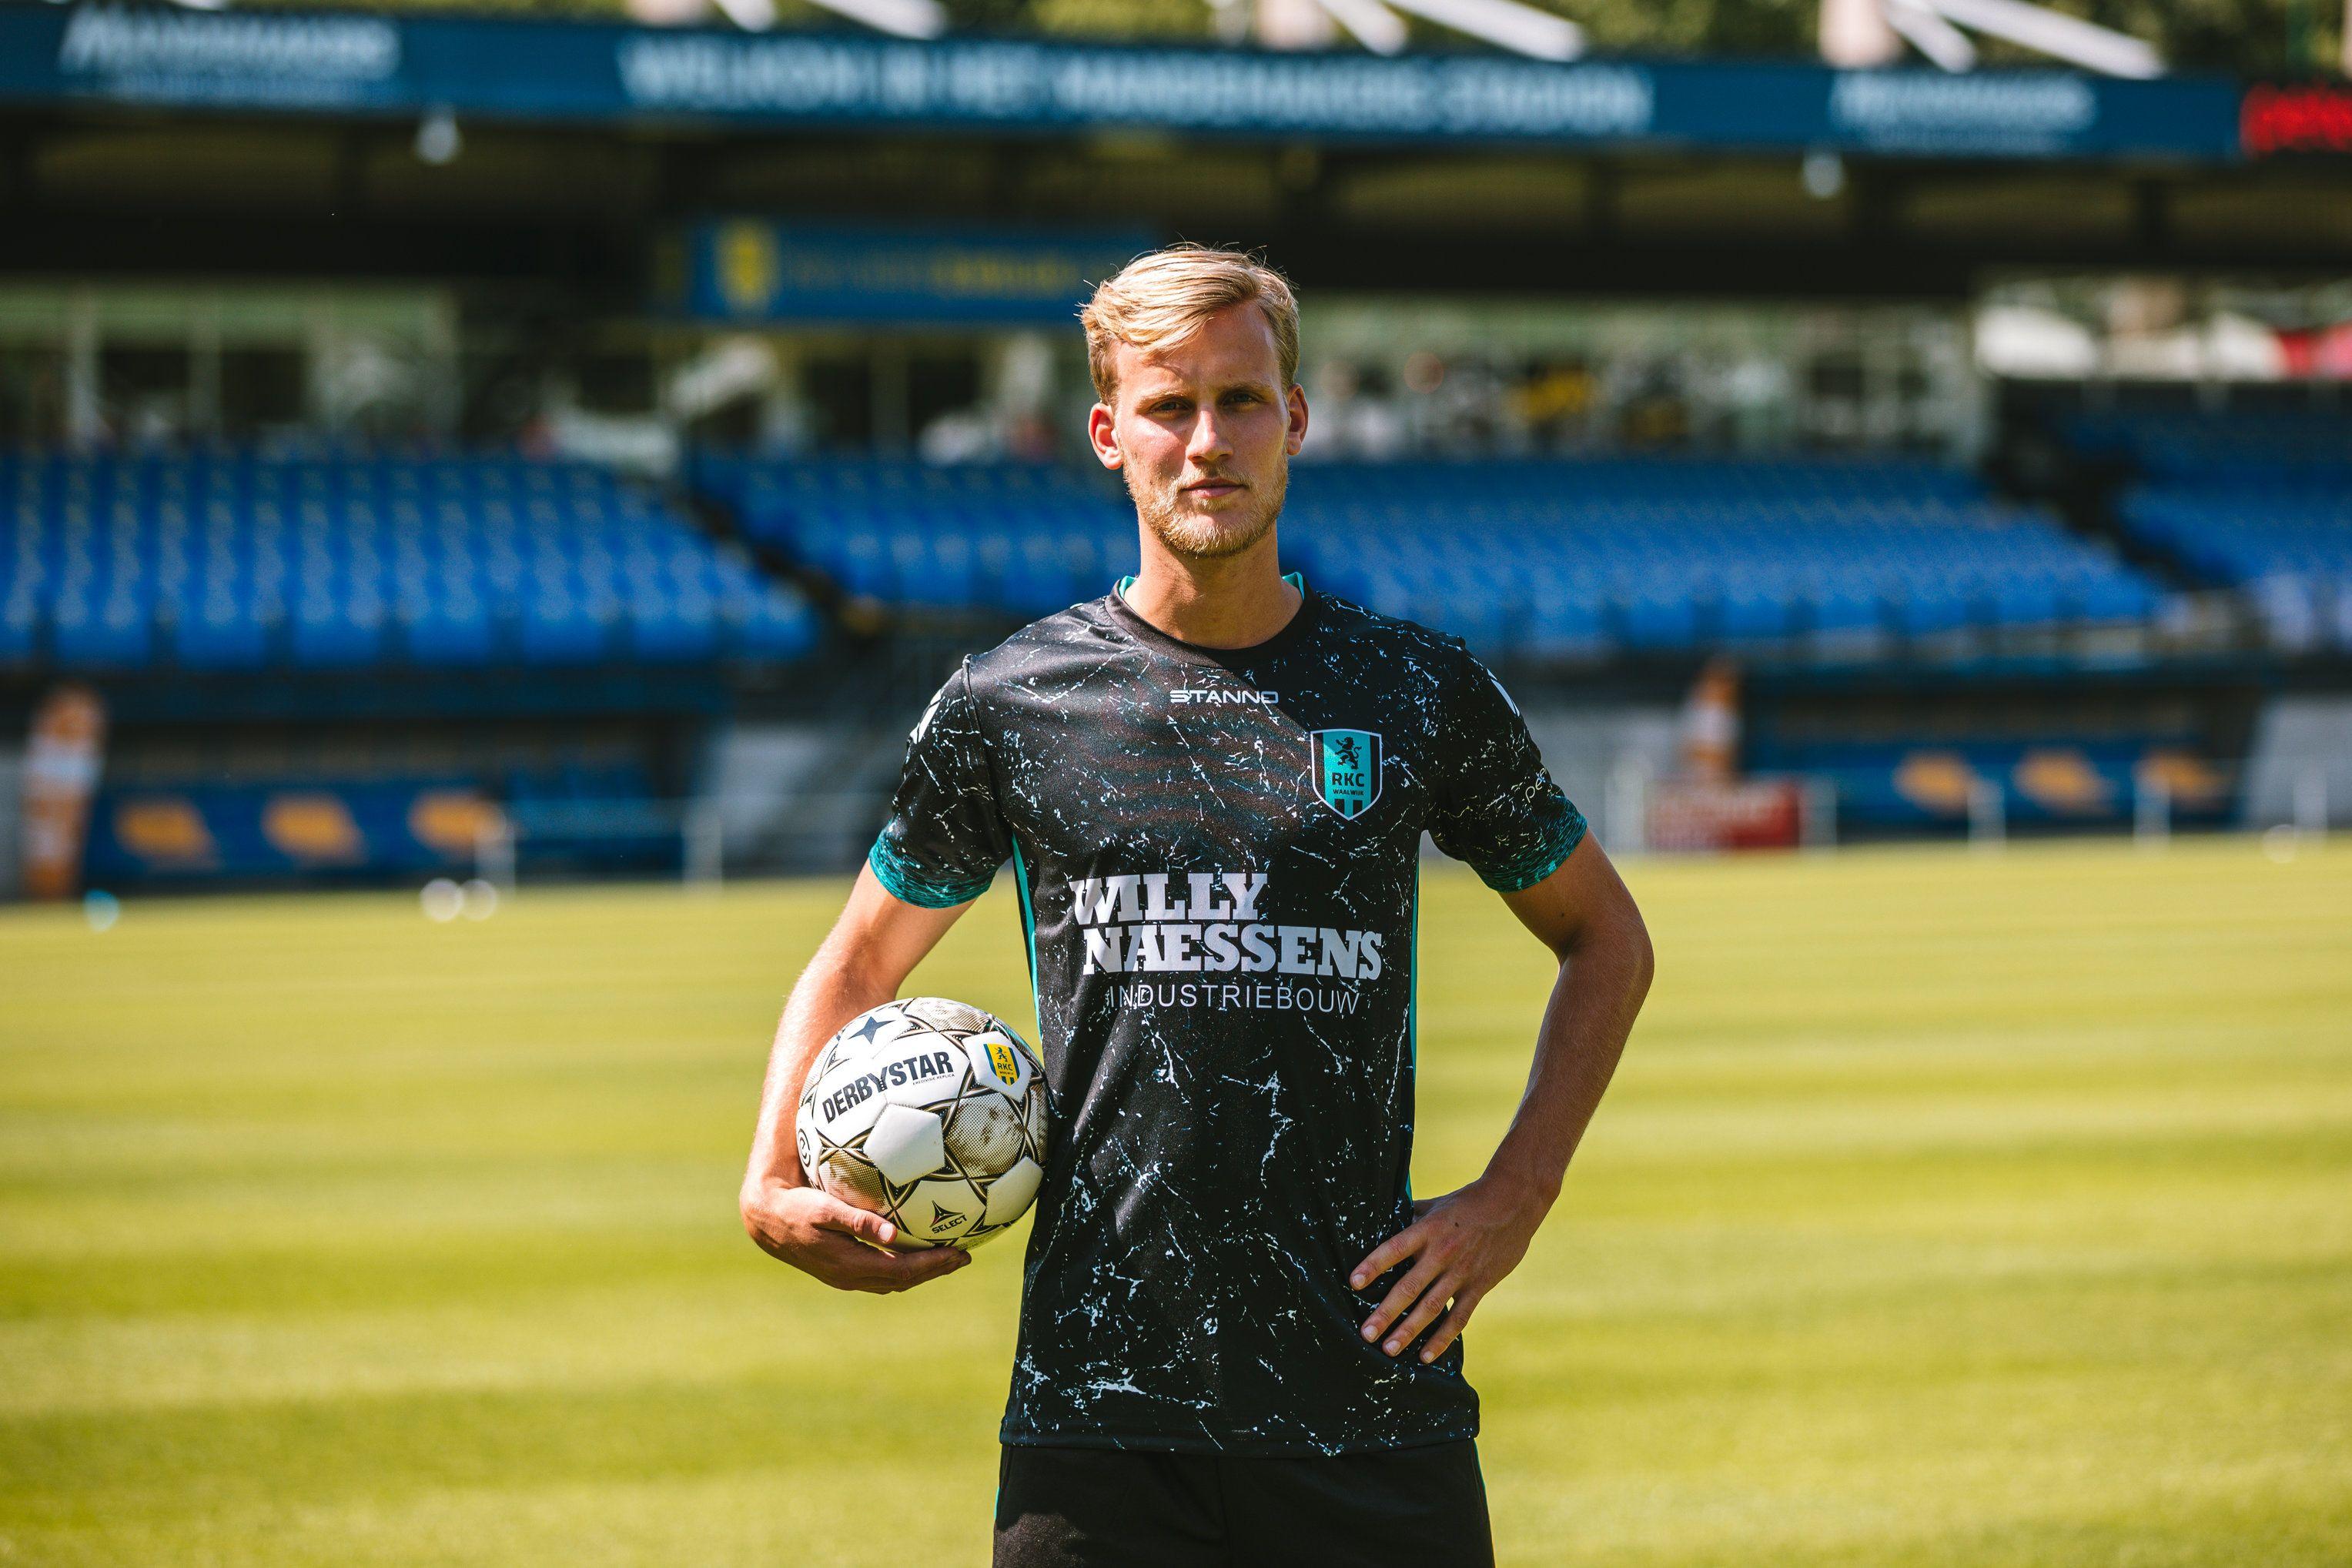 Pin op Voetbalshirts Eredivisie 2020/2021